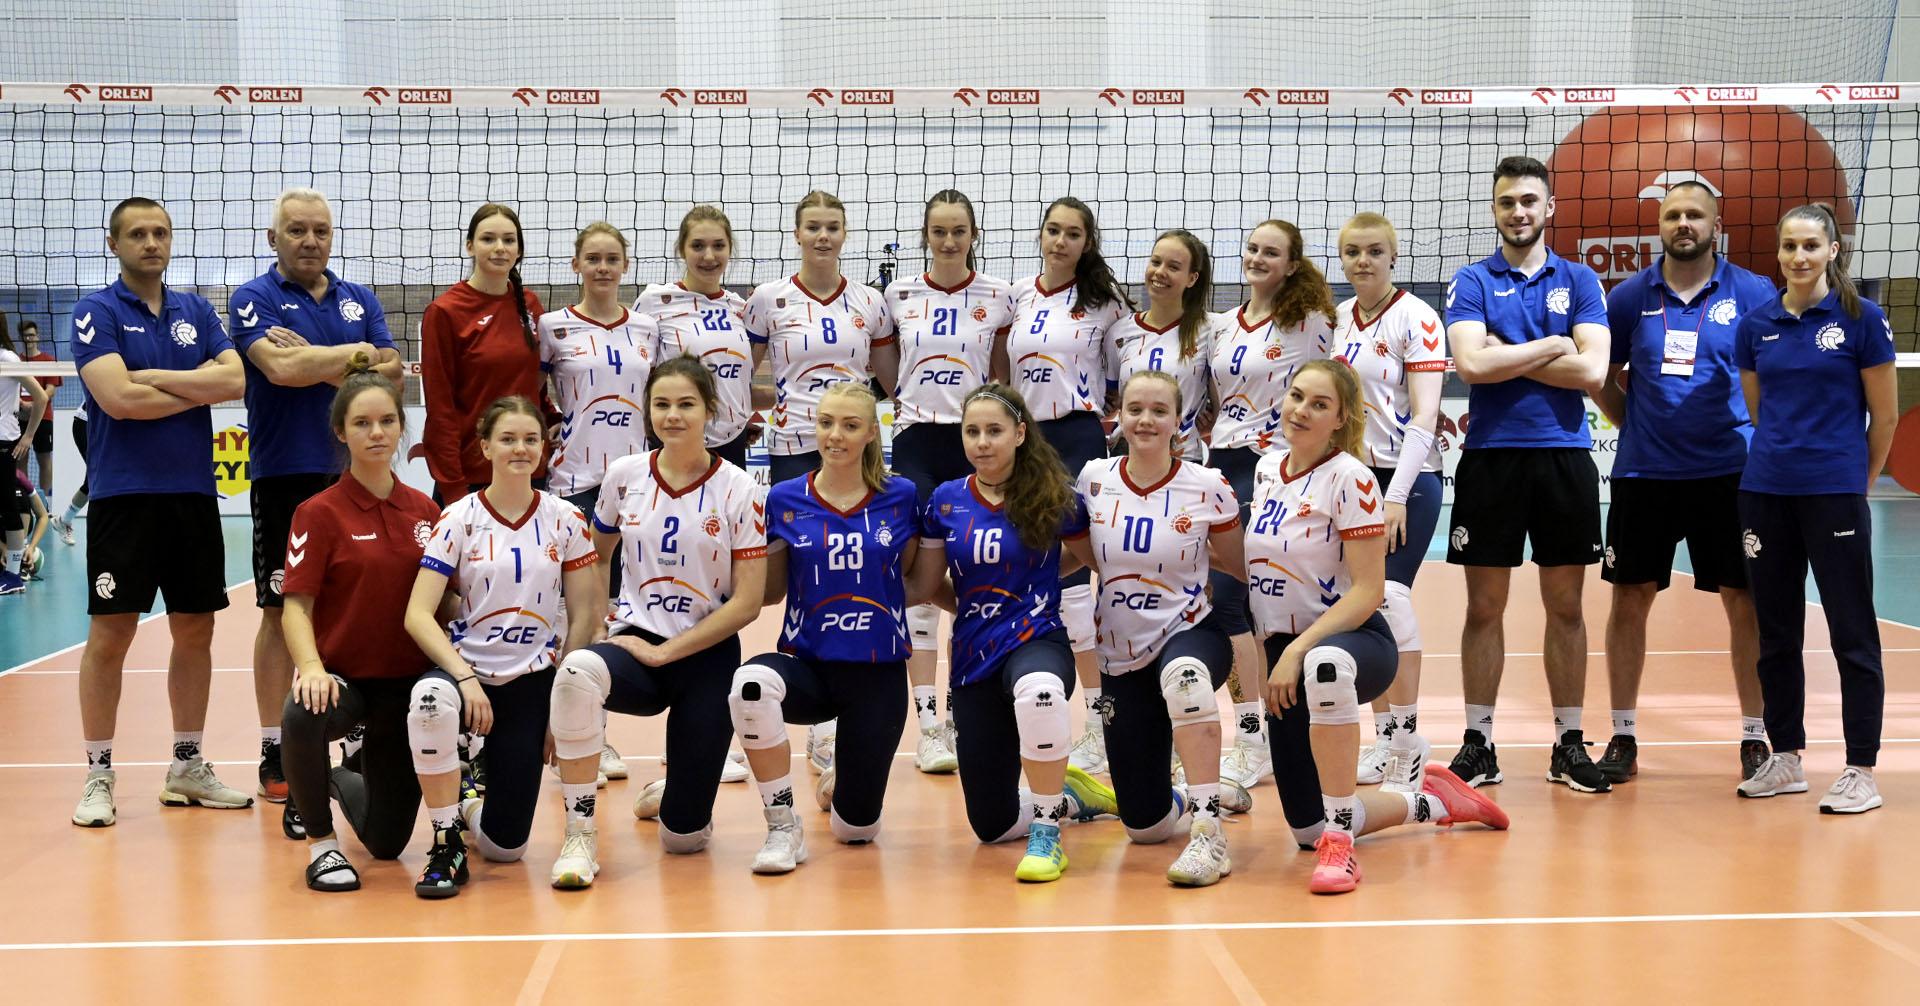 LTS Legionovia Legionowo (MMP Finał Juniorek Młodszych Grupa A sezon 2020/2021)